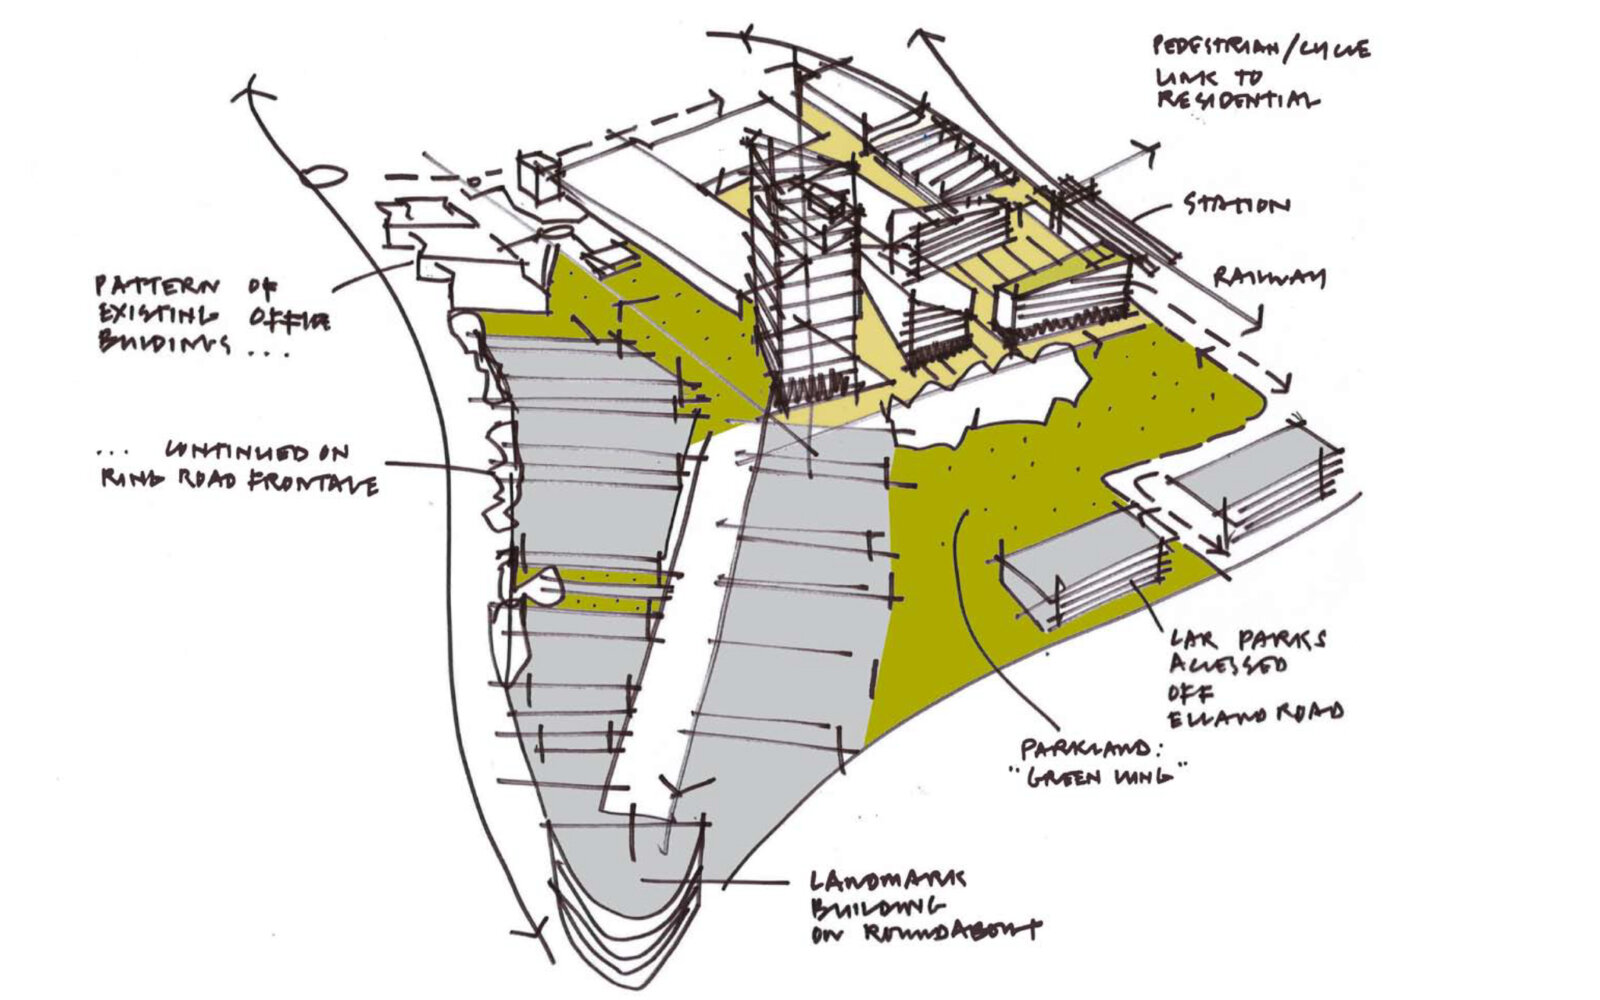 White Rose Office Park Masterplan sketch